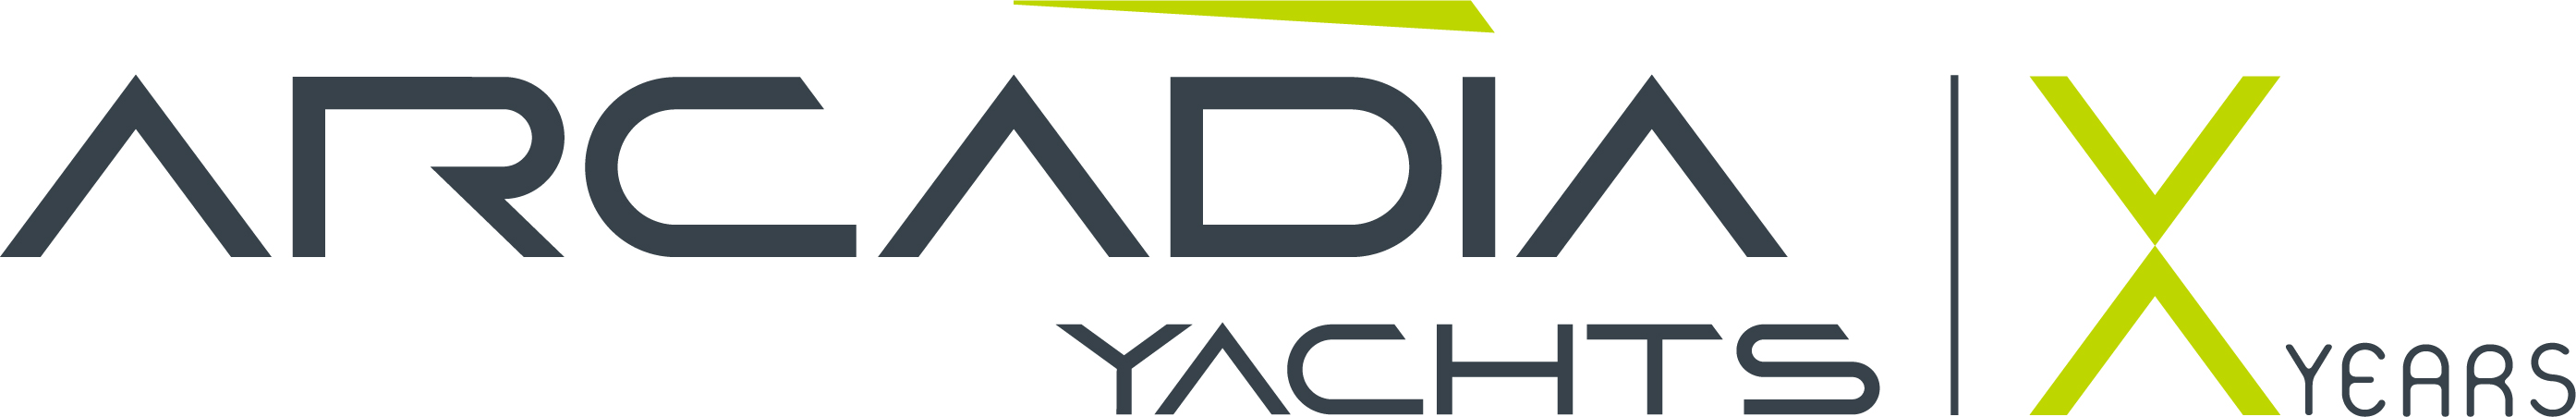 Arcadia Yachts logo